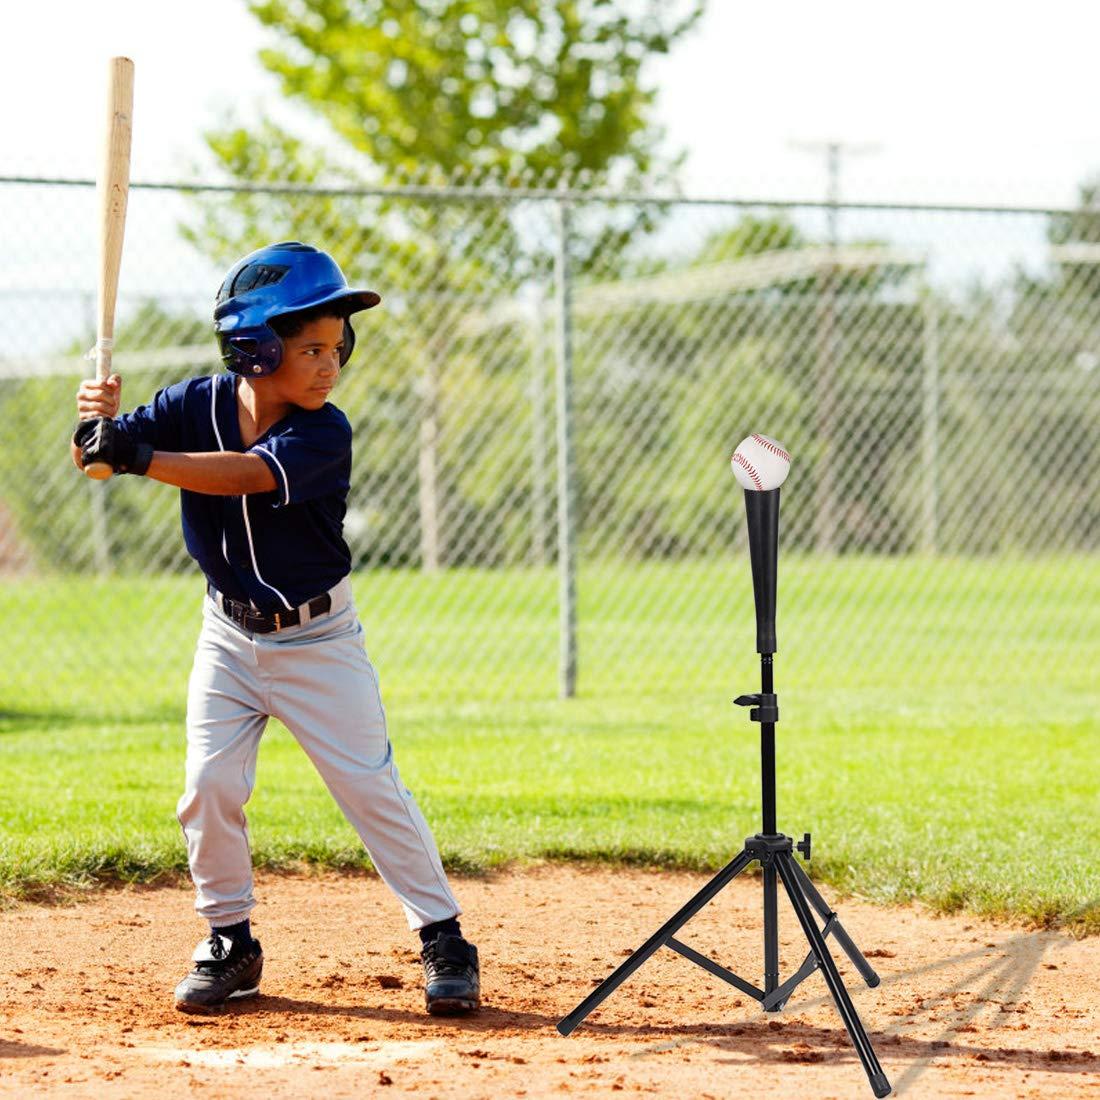 Batting Tee Baseball Softball Portable Training Sport Equipment Travel Athletic